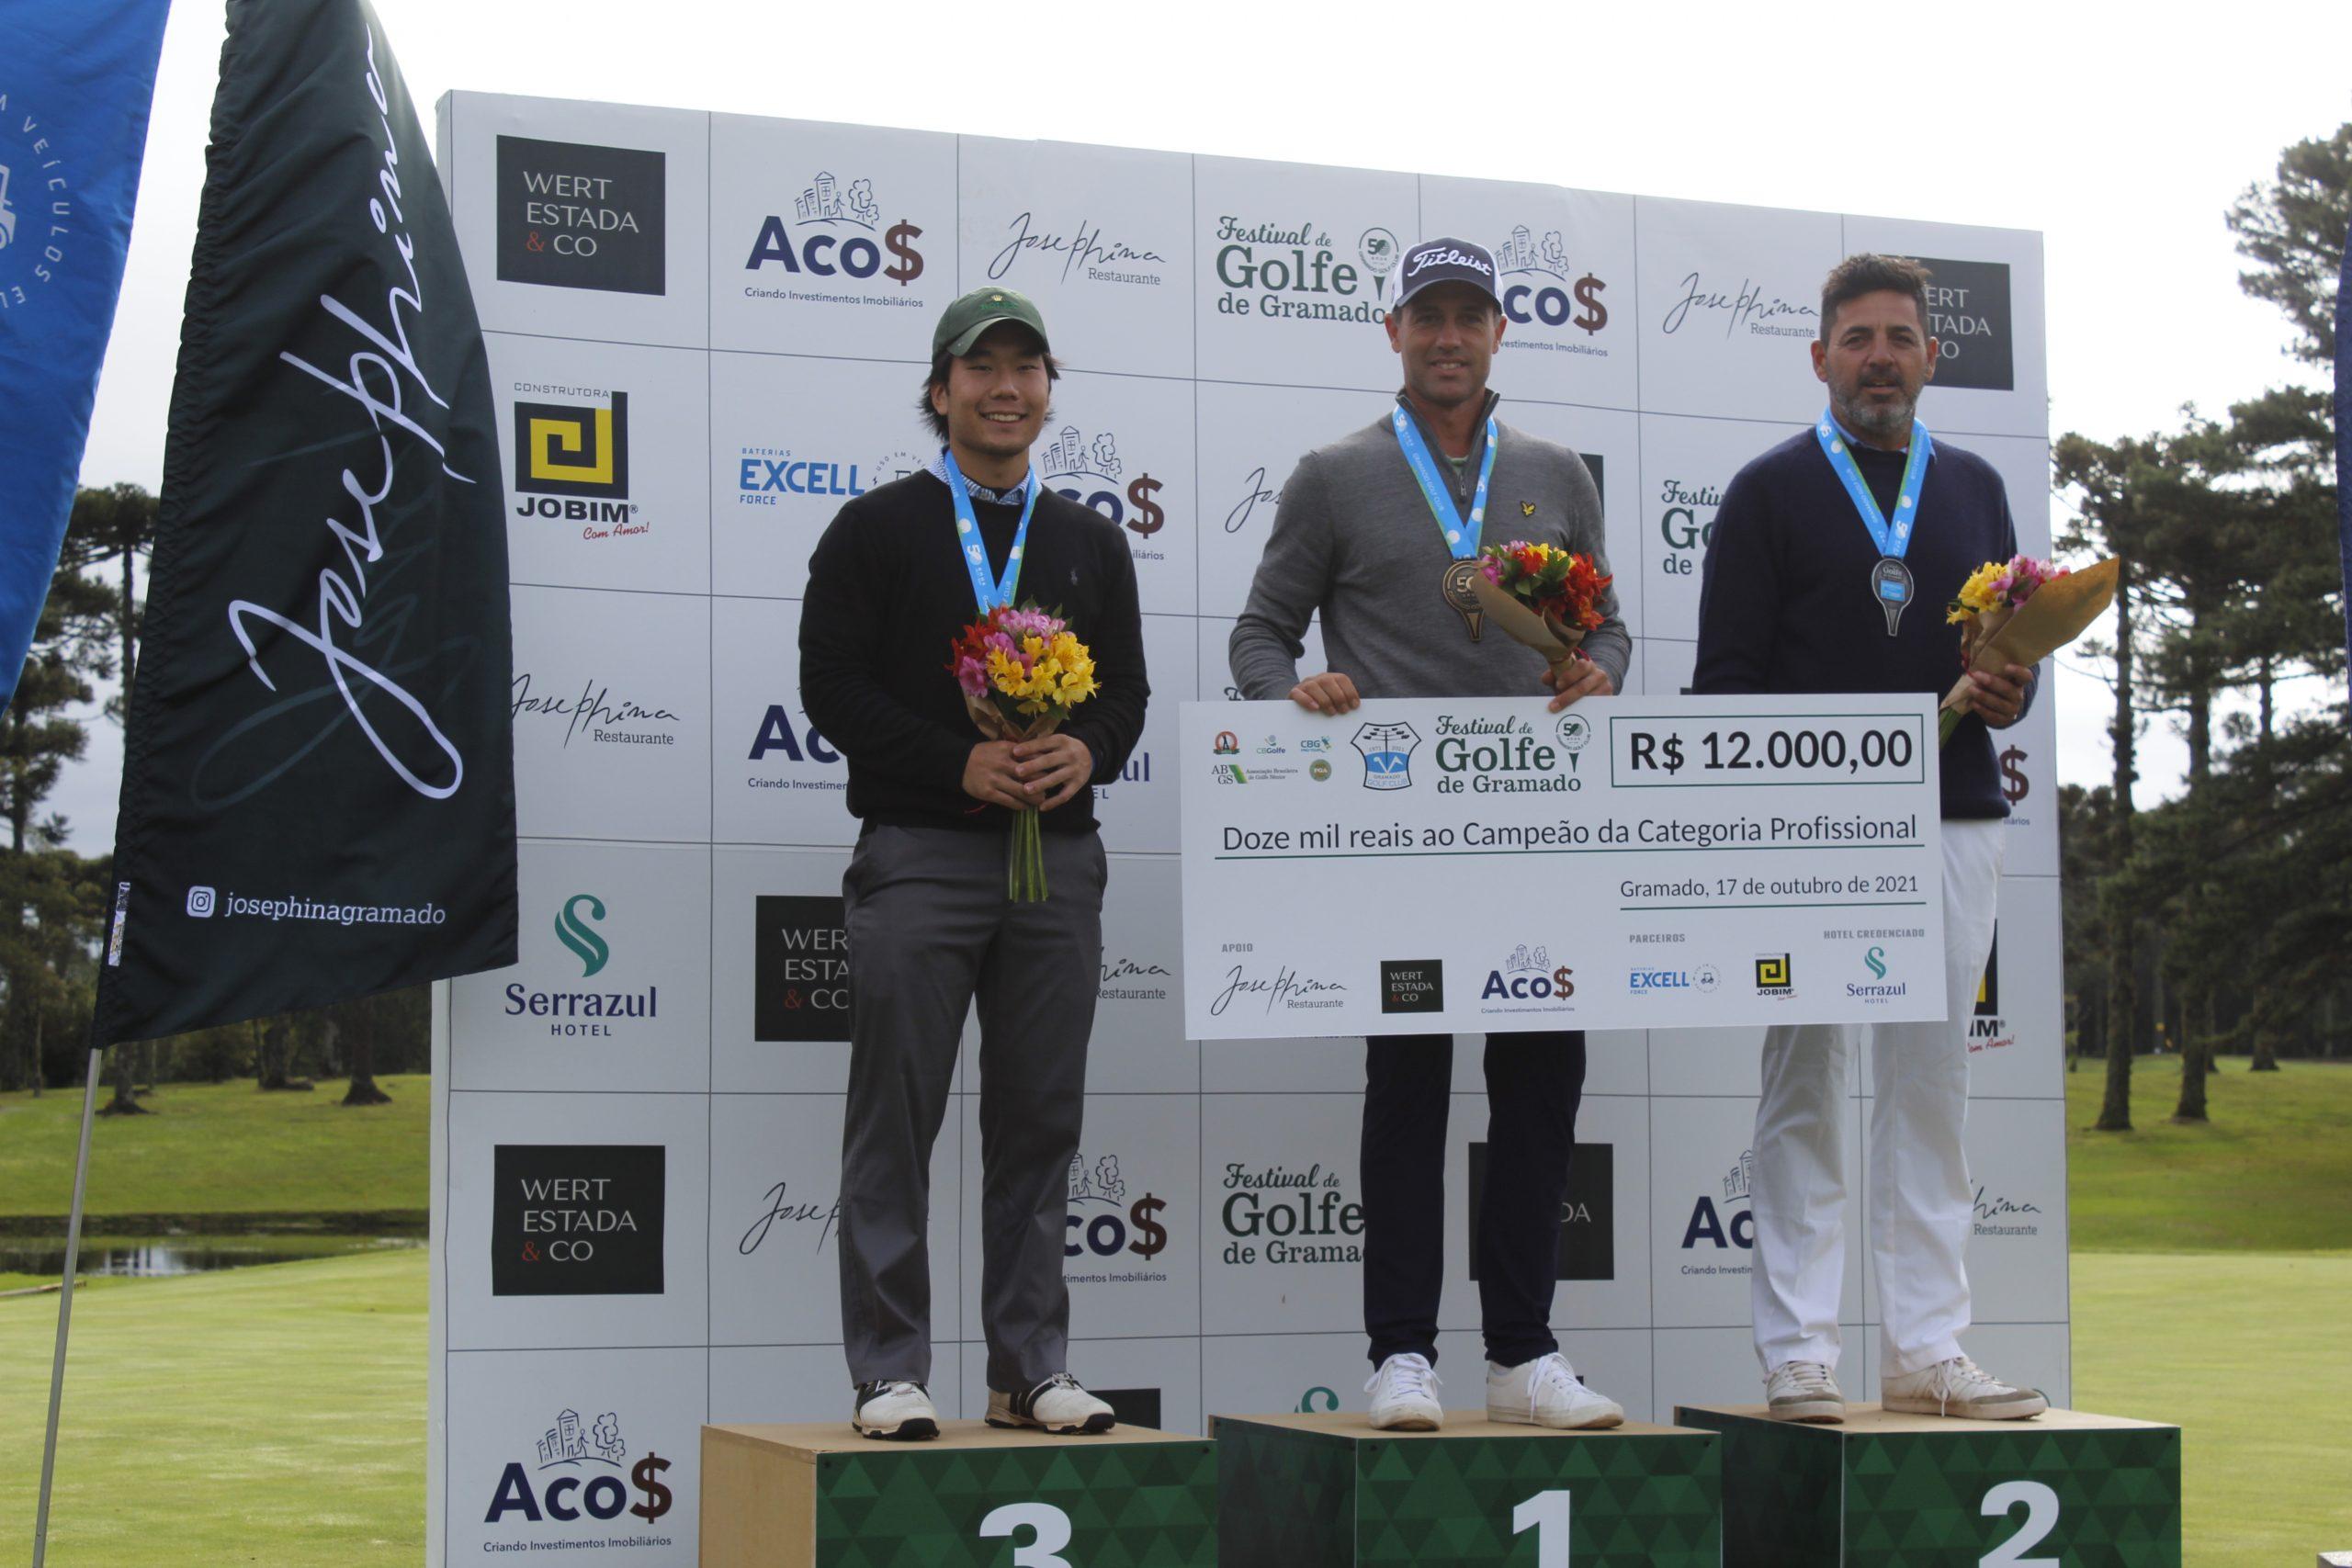 Festival de Golfe de Gramado comemorou os 50 anos do clube